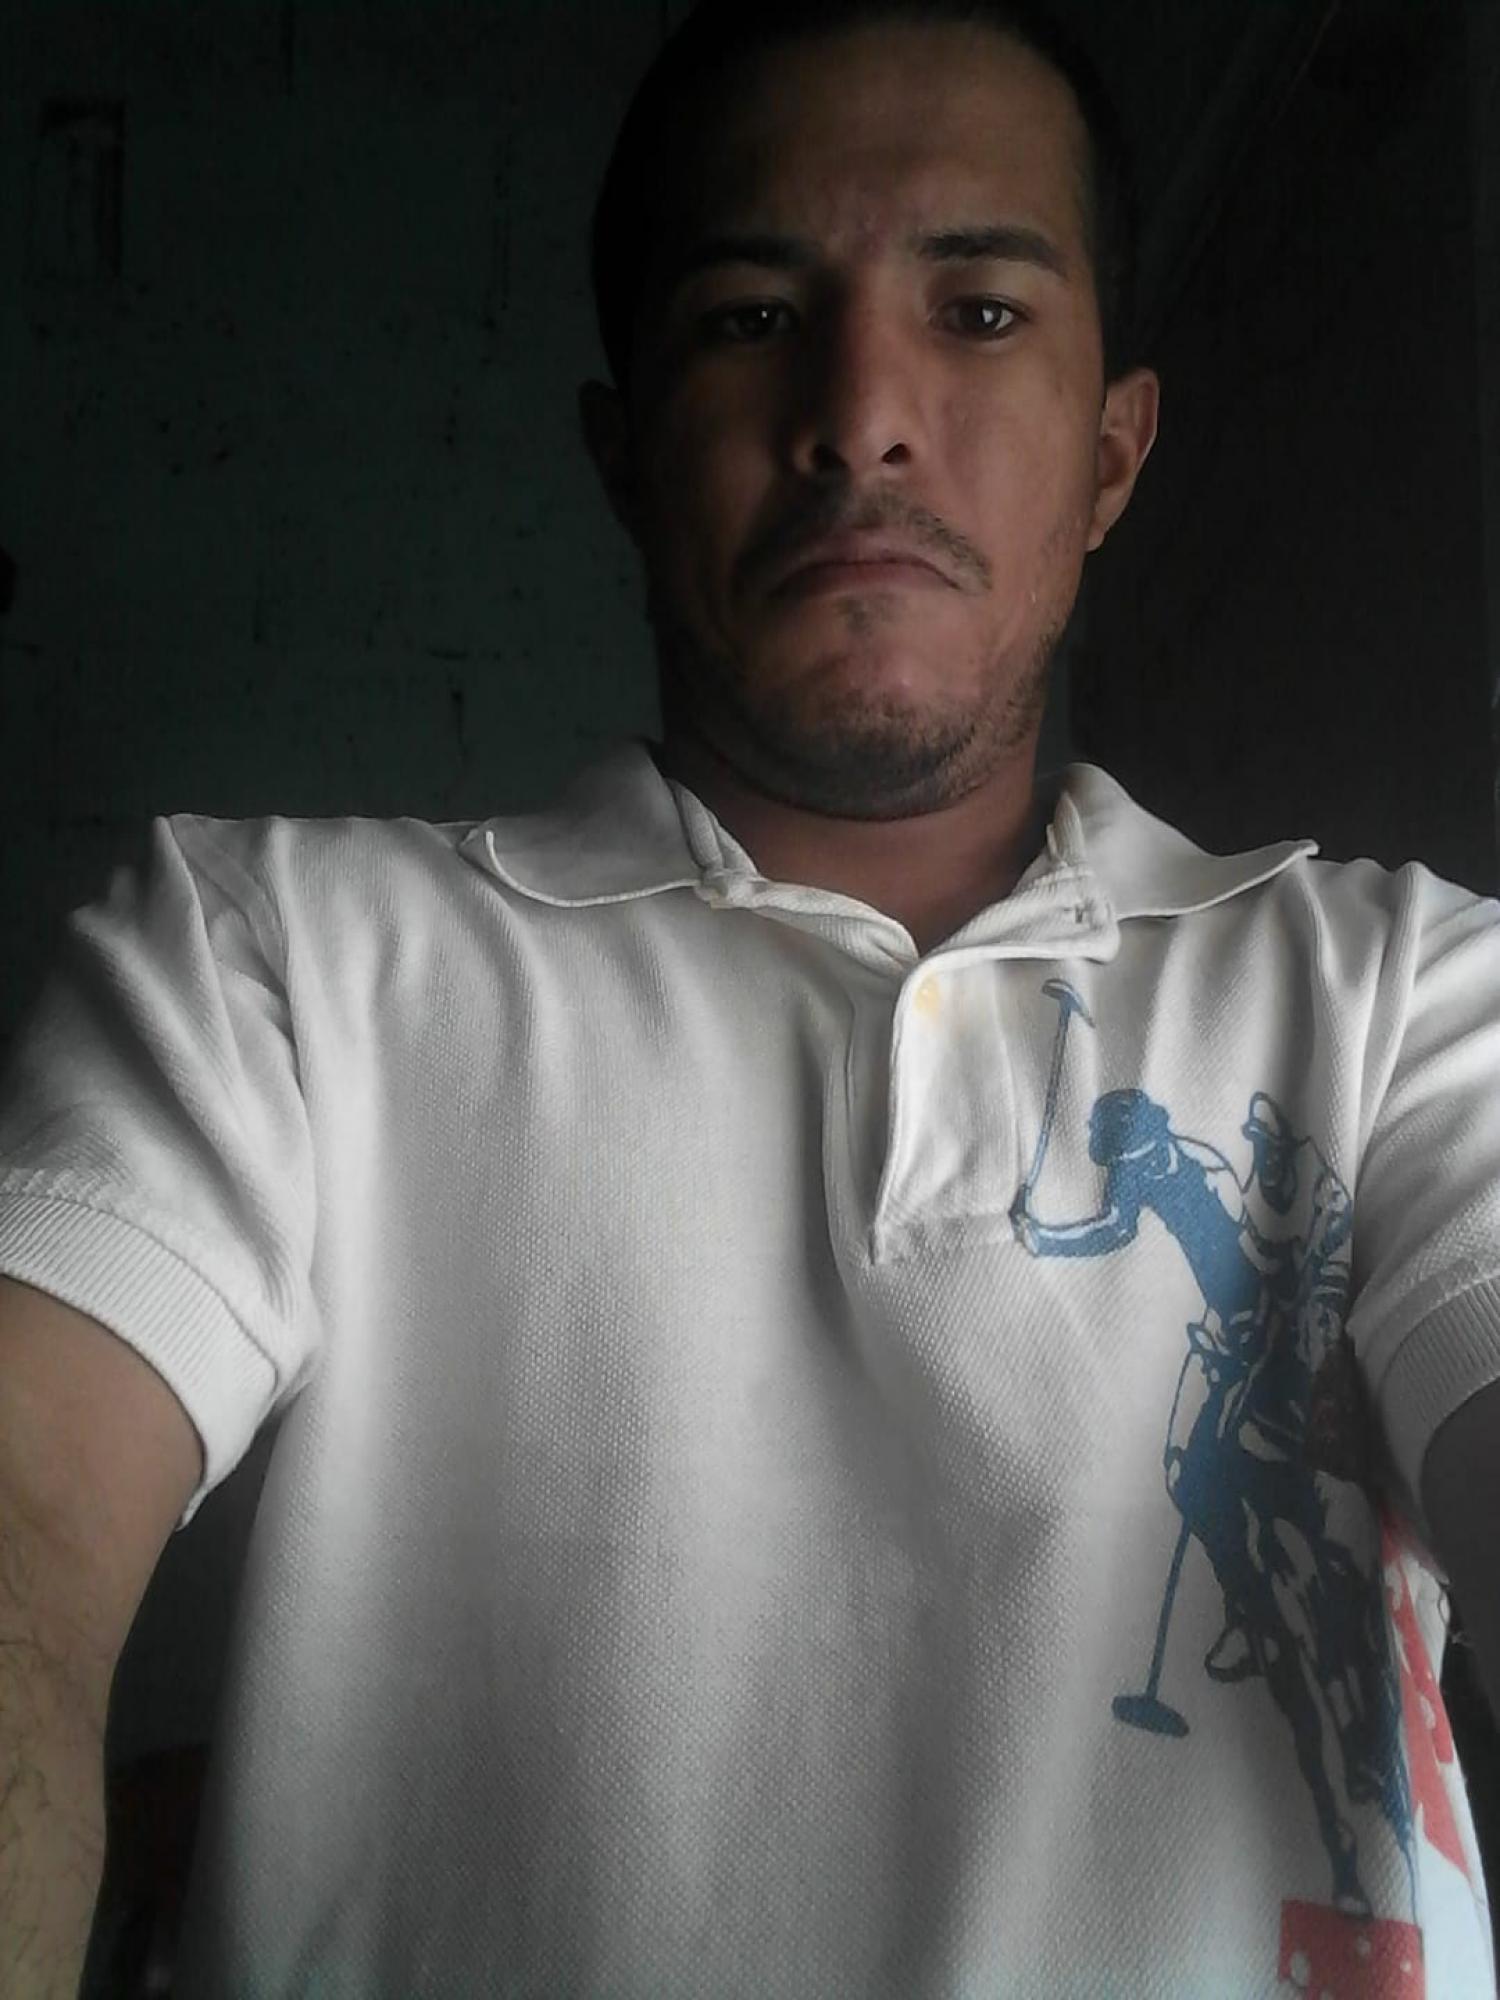 Wilson Andres Rivera Cagua cover photo